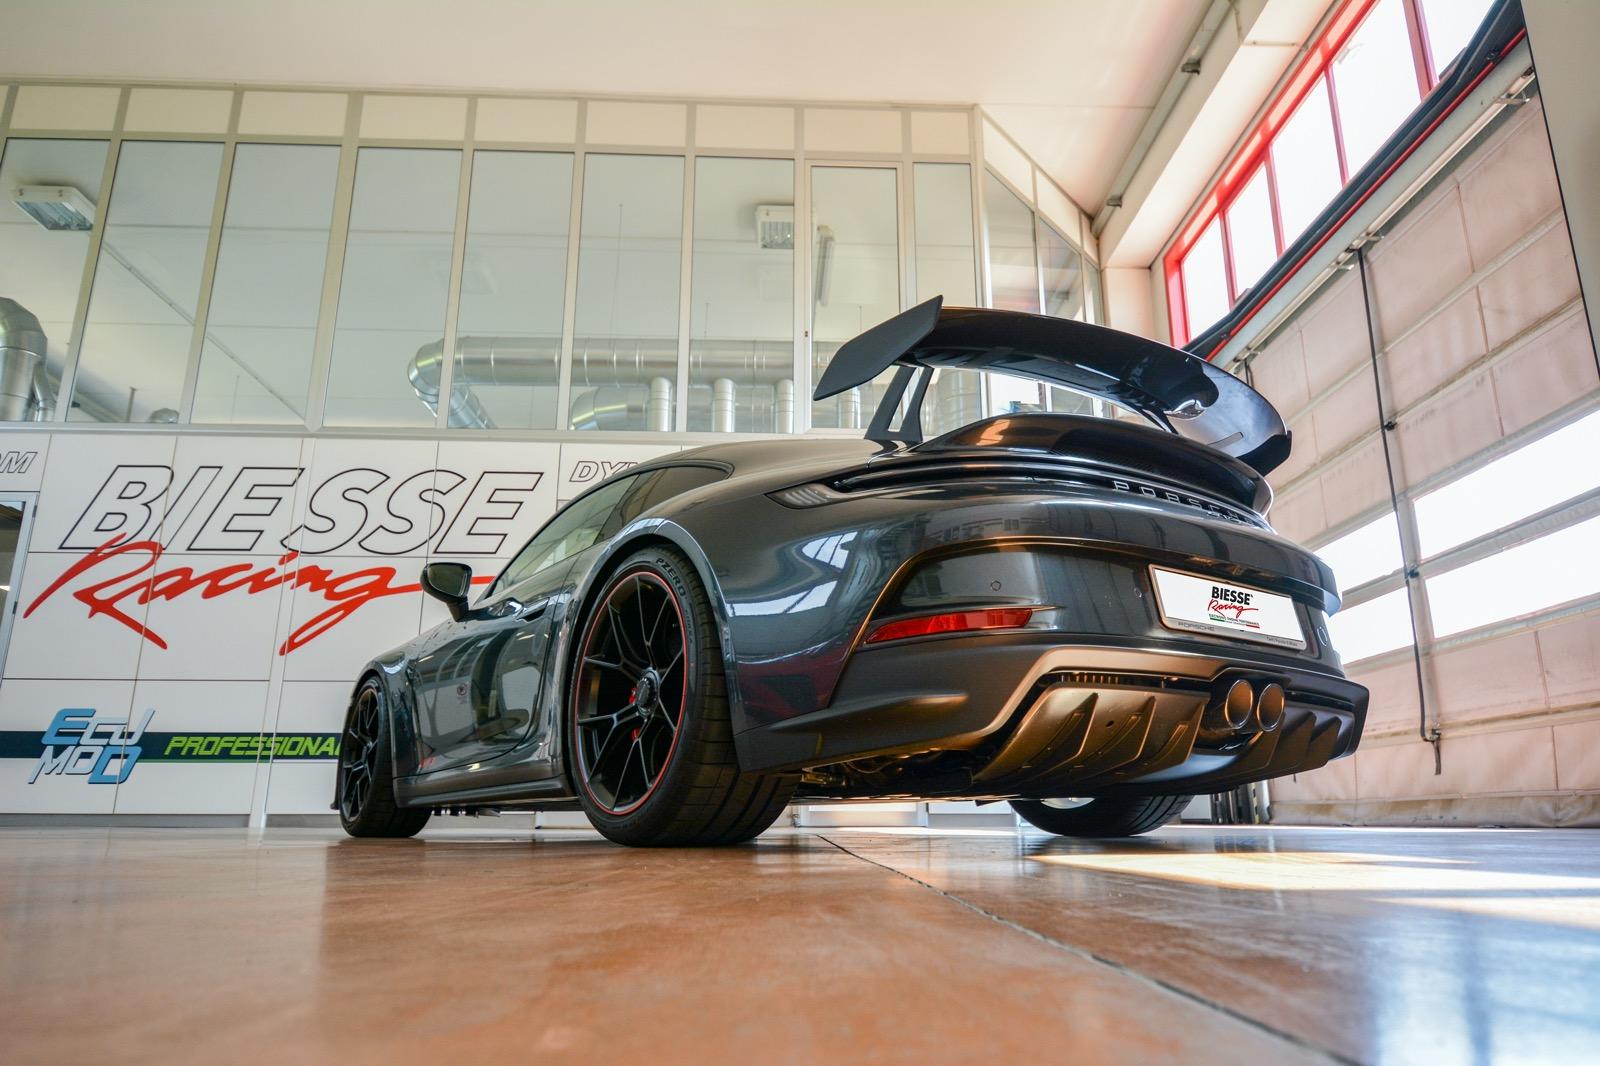 World Première: Porsche 911 992 GT3 Stage1+ full Tubi Style exhaust